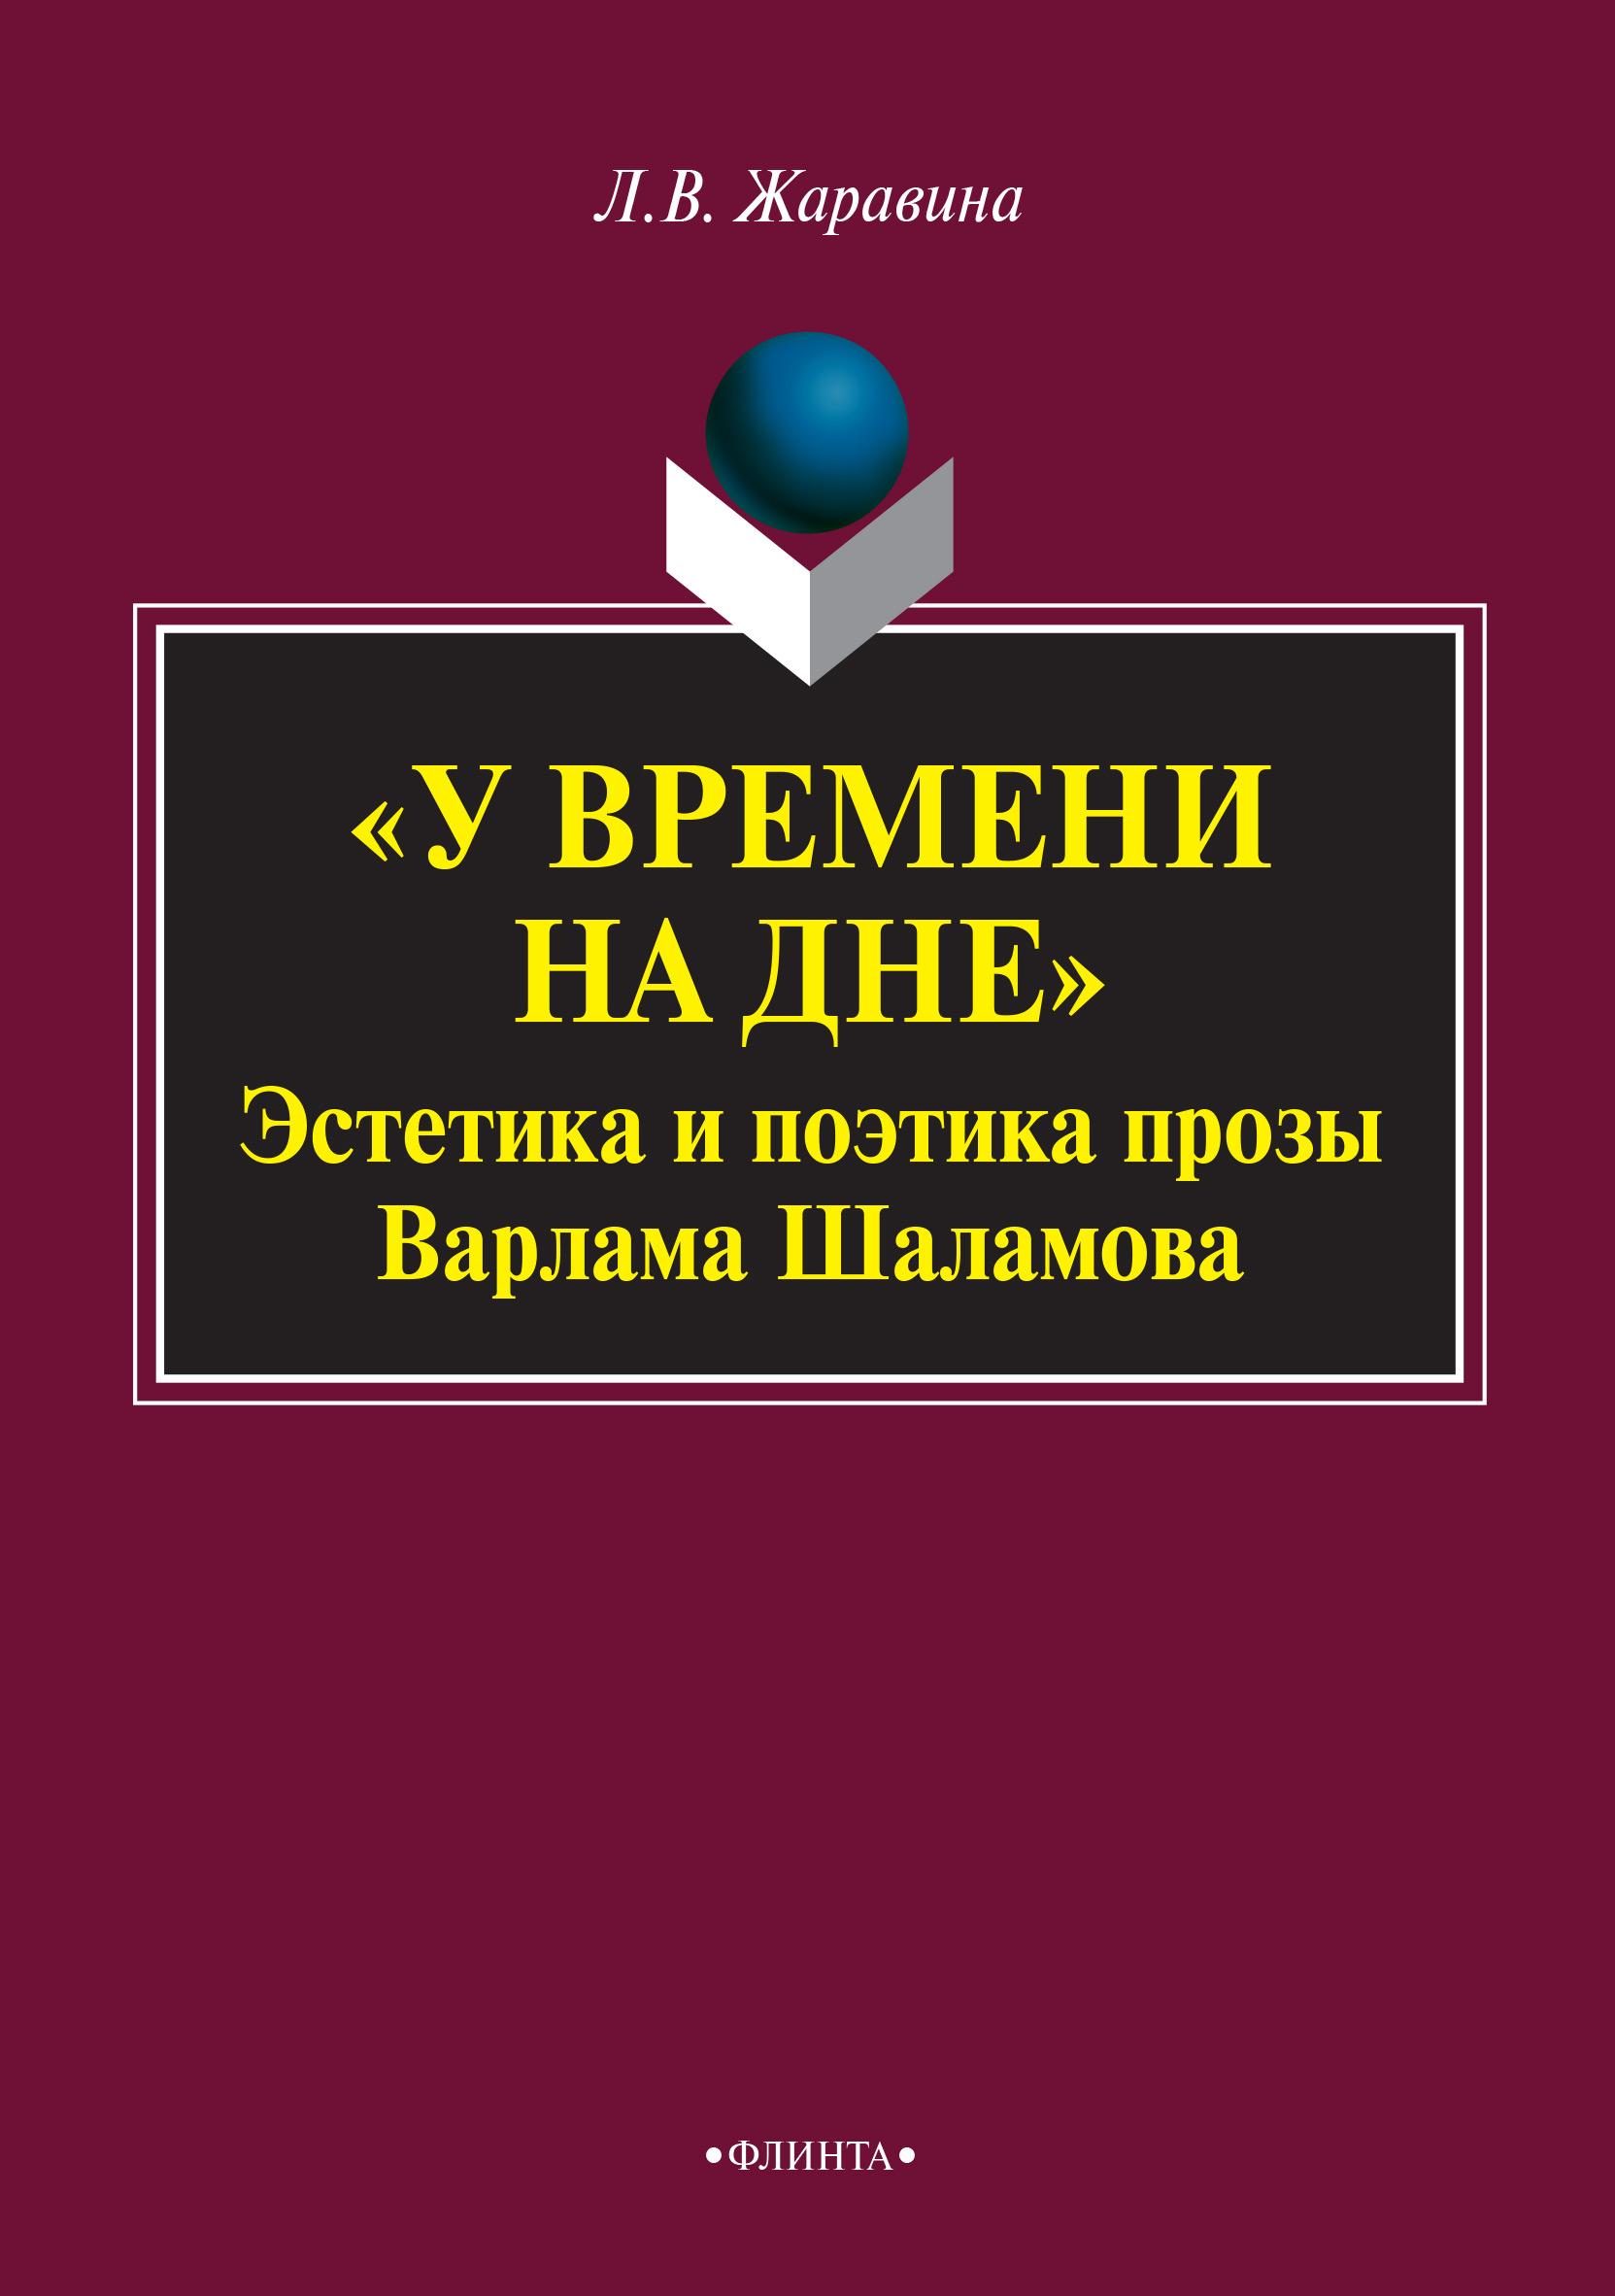 Л. В. Жаравина «У времени на дне»: эстетика и поэтика прозы Варлама Шаламова. Монография